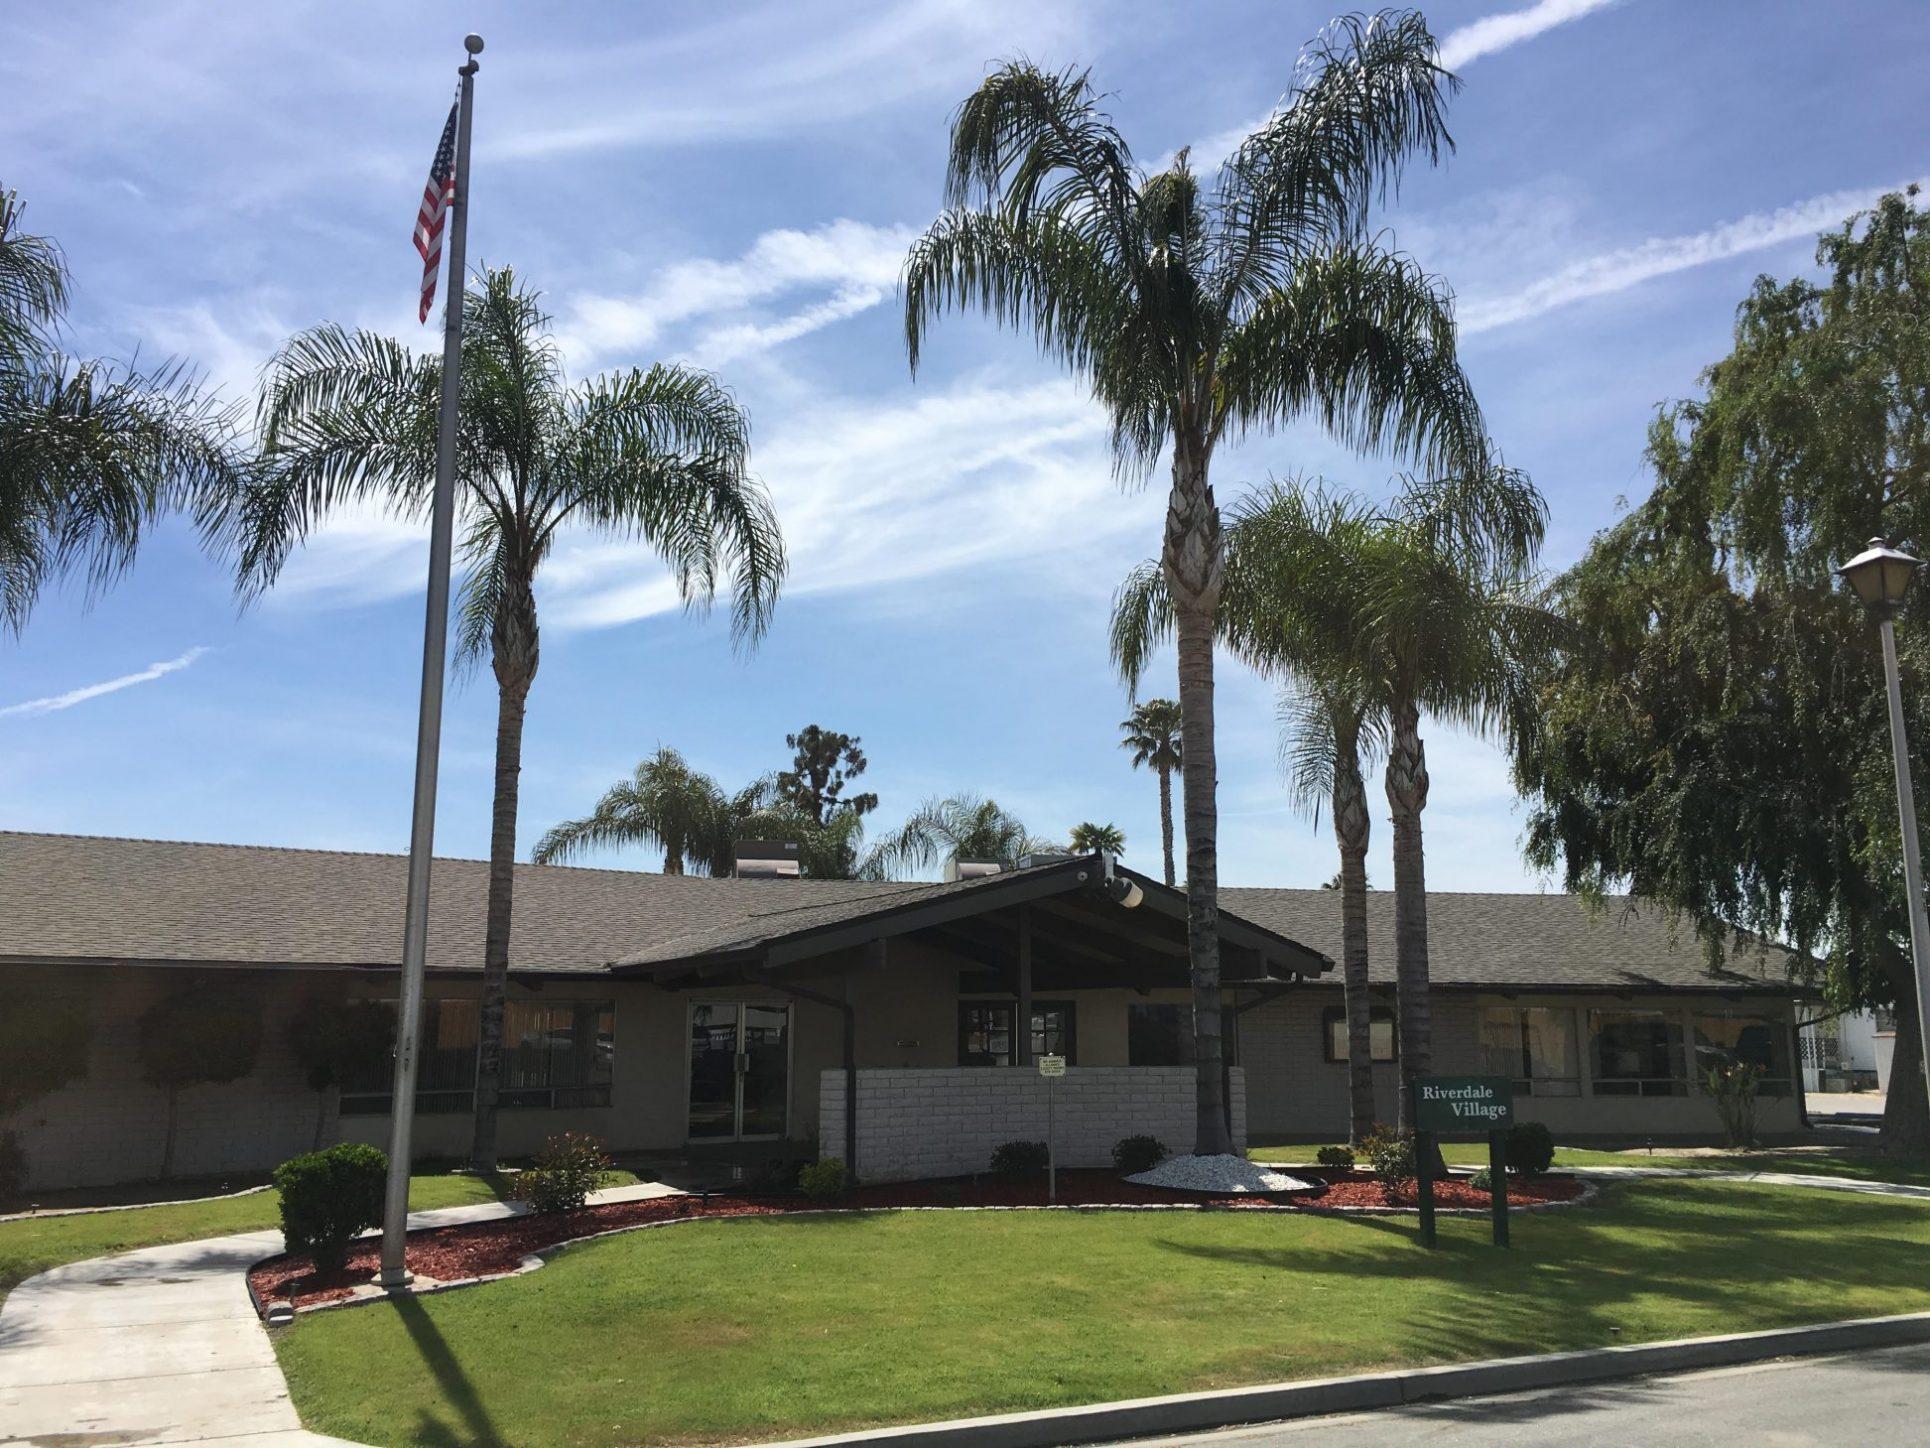 Riverdale Village front office